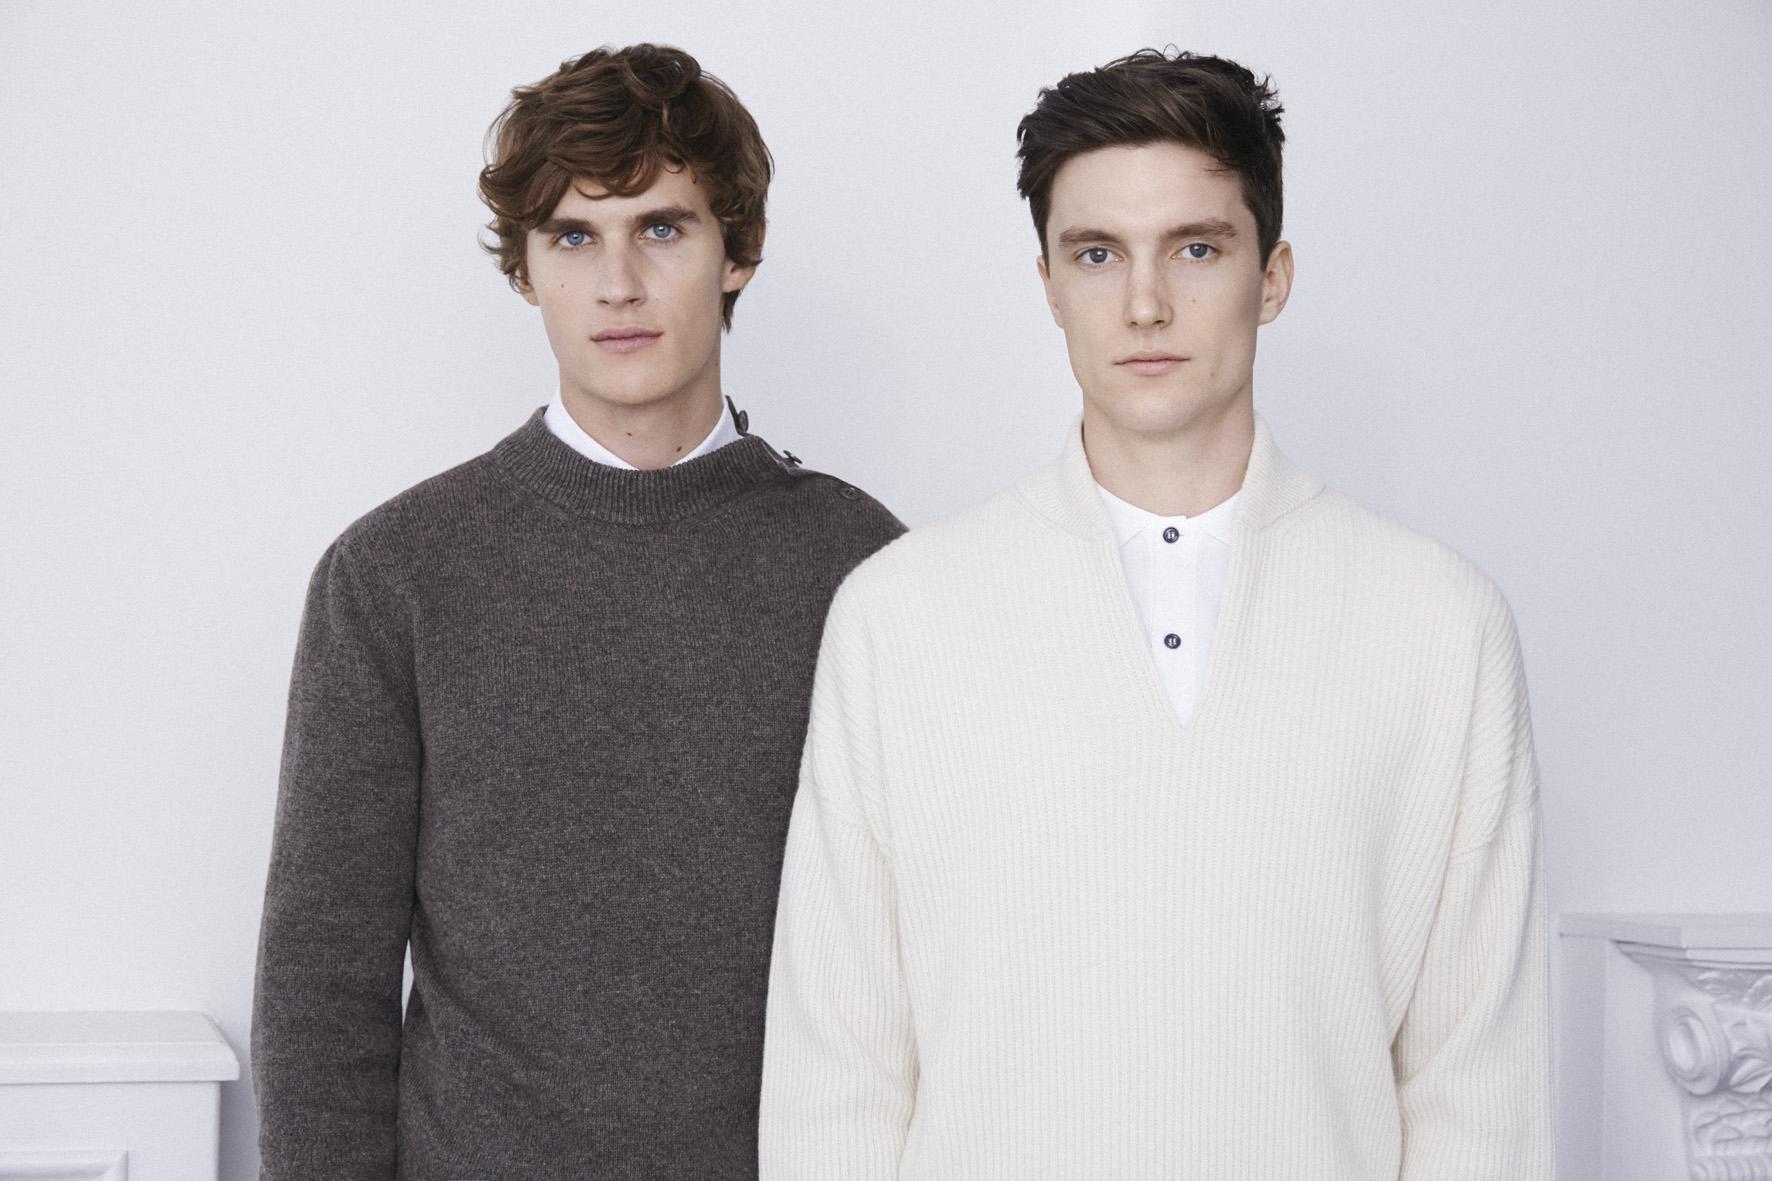 MR Porter Spring 2015 | Carlotta Manaigo | Mr Porter | Numéro | Lorenzo Posocco | Numerique Retouch Photo Retouching Studio